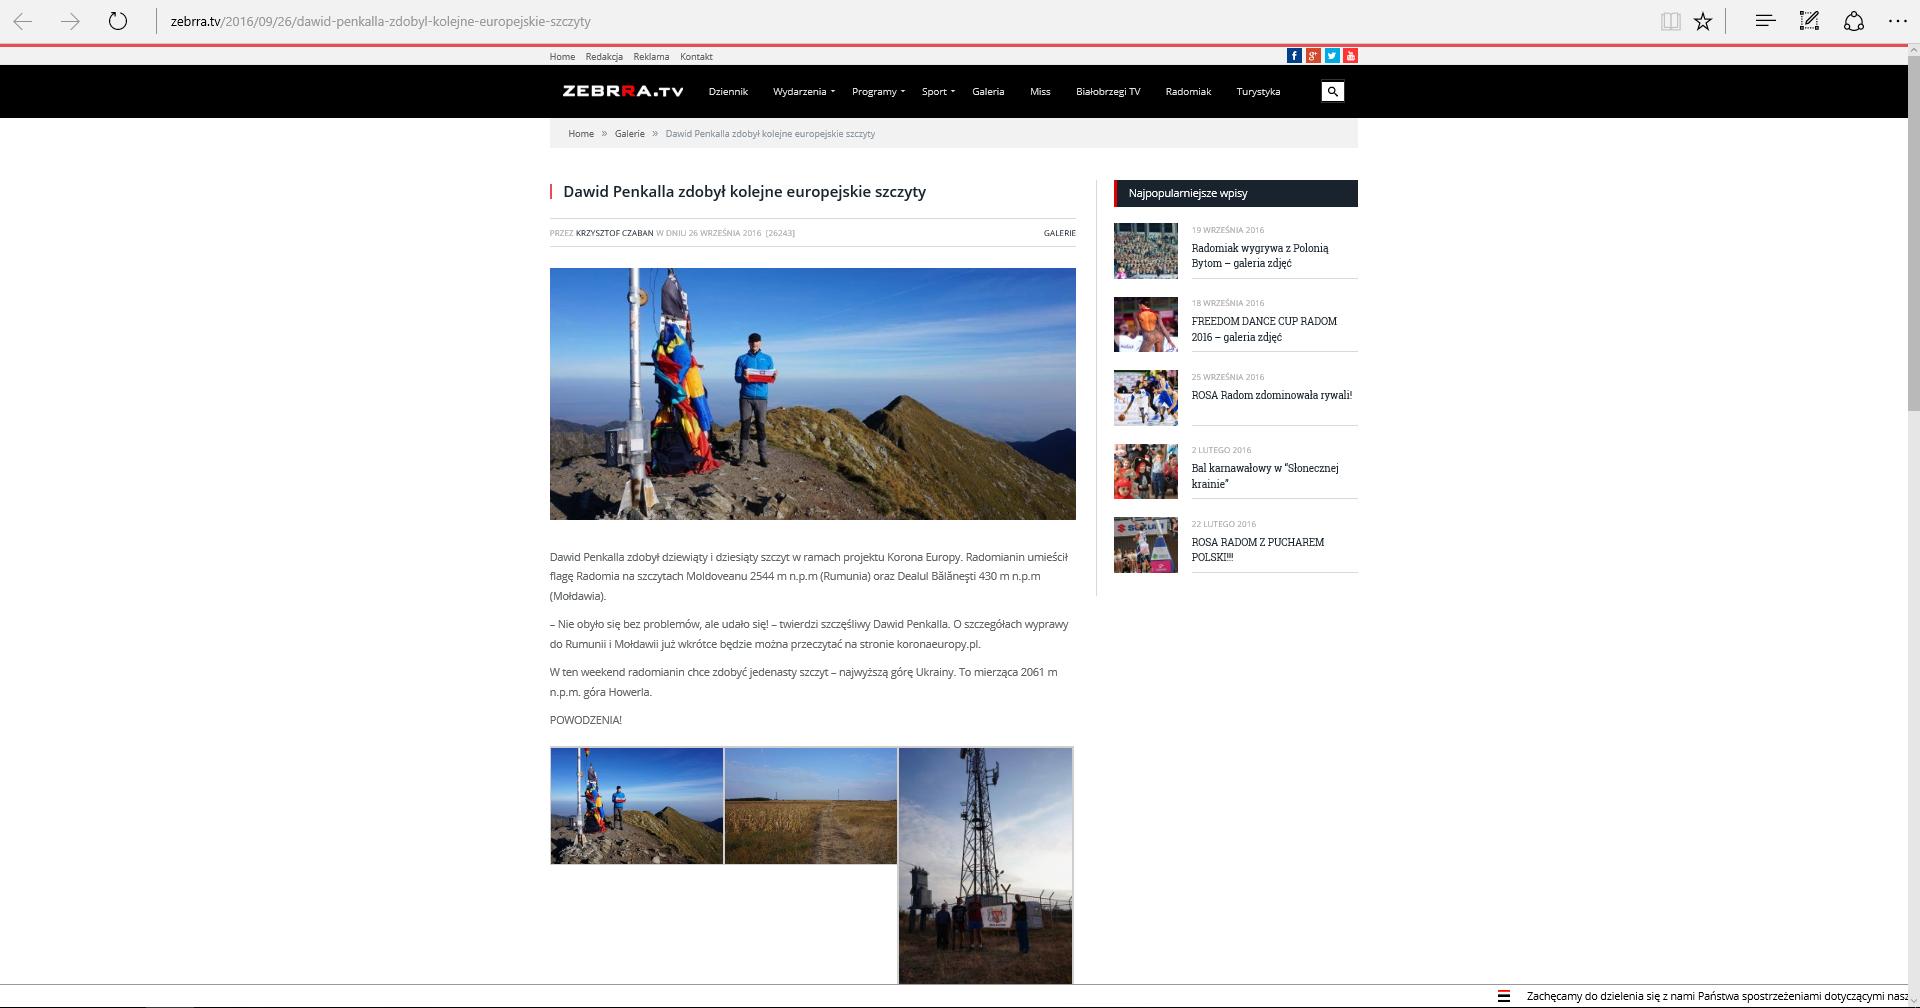 zebra.tv 26.09.2016 koronaeuropy.pl